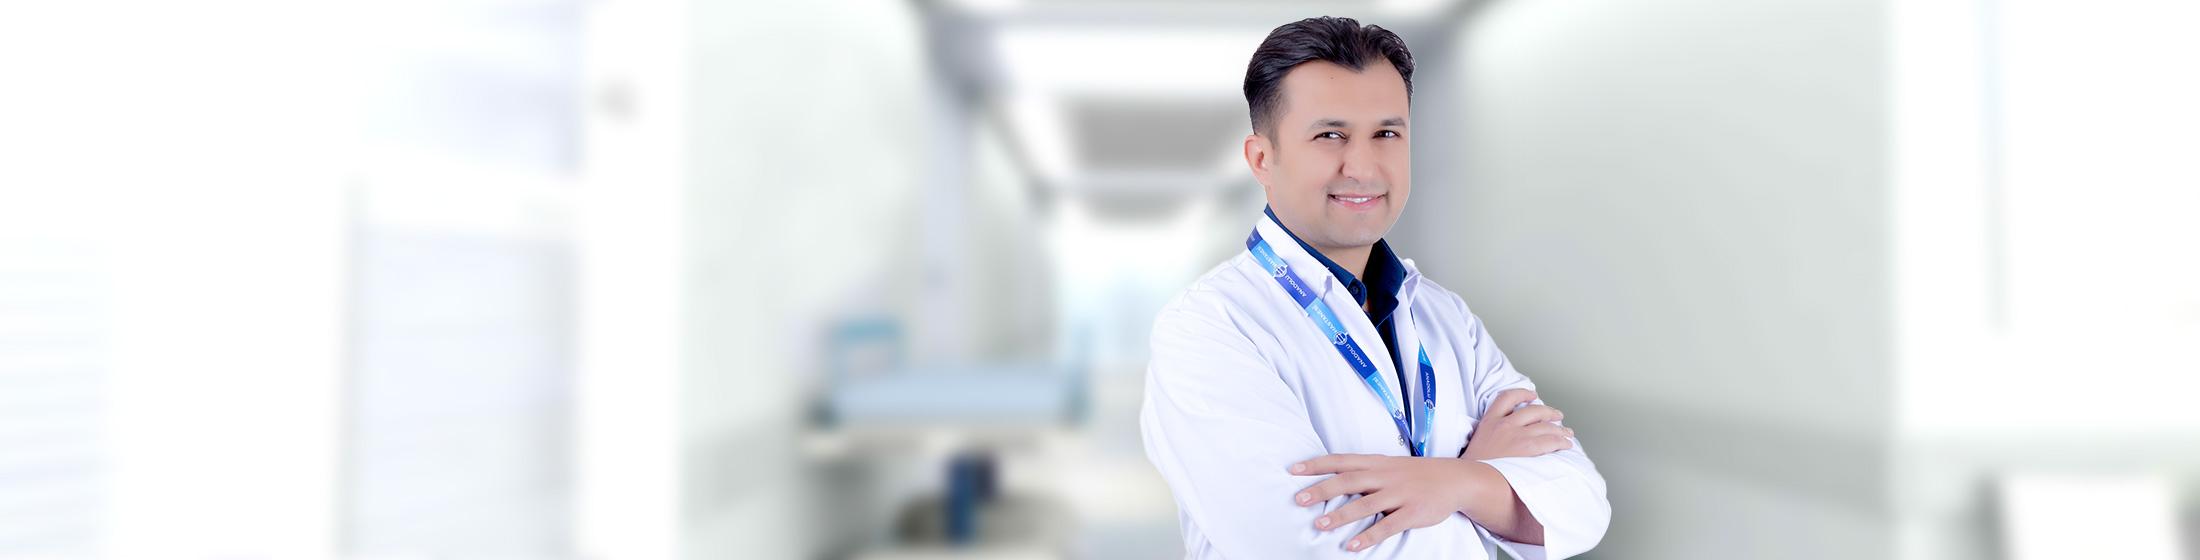 Uzm  Dr  Emrah Uyanık | Emergency Service | Ministry Certified Ozone